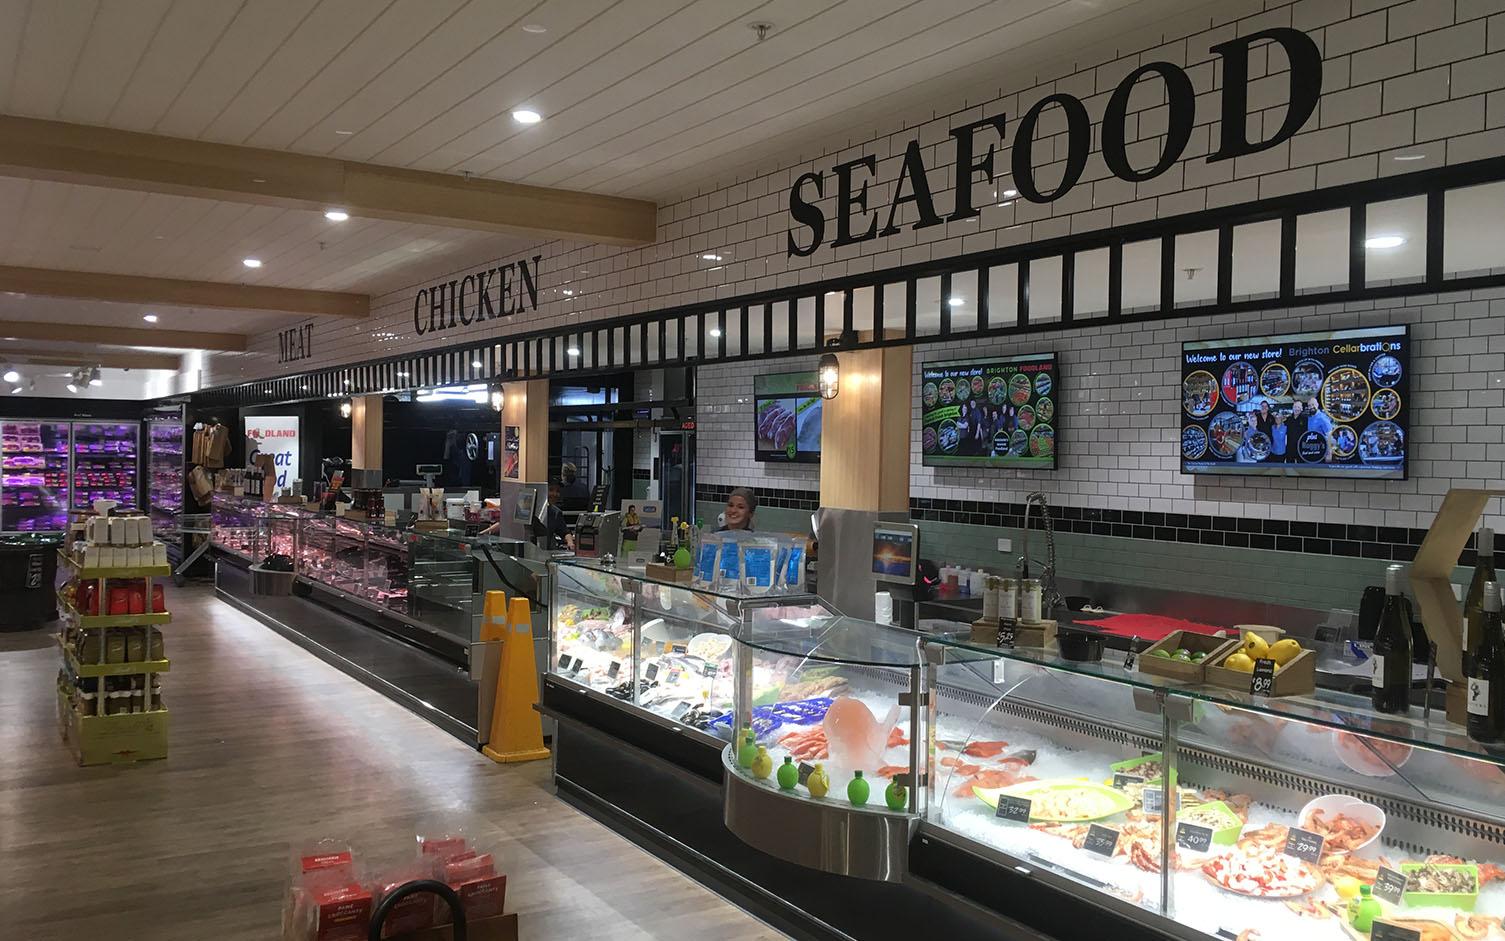 https://ggtiling.com.au/wp-content/uploads/2018/11/Brighton-Central-Shopping-Centre_0006_20180226_062313070_iOS.jpg